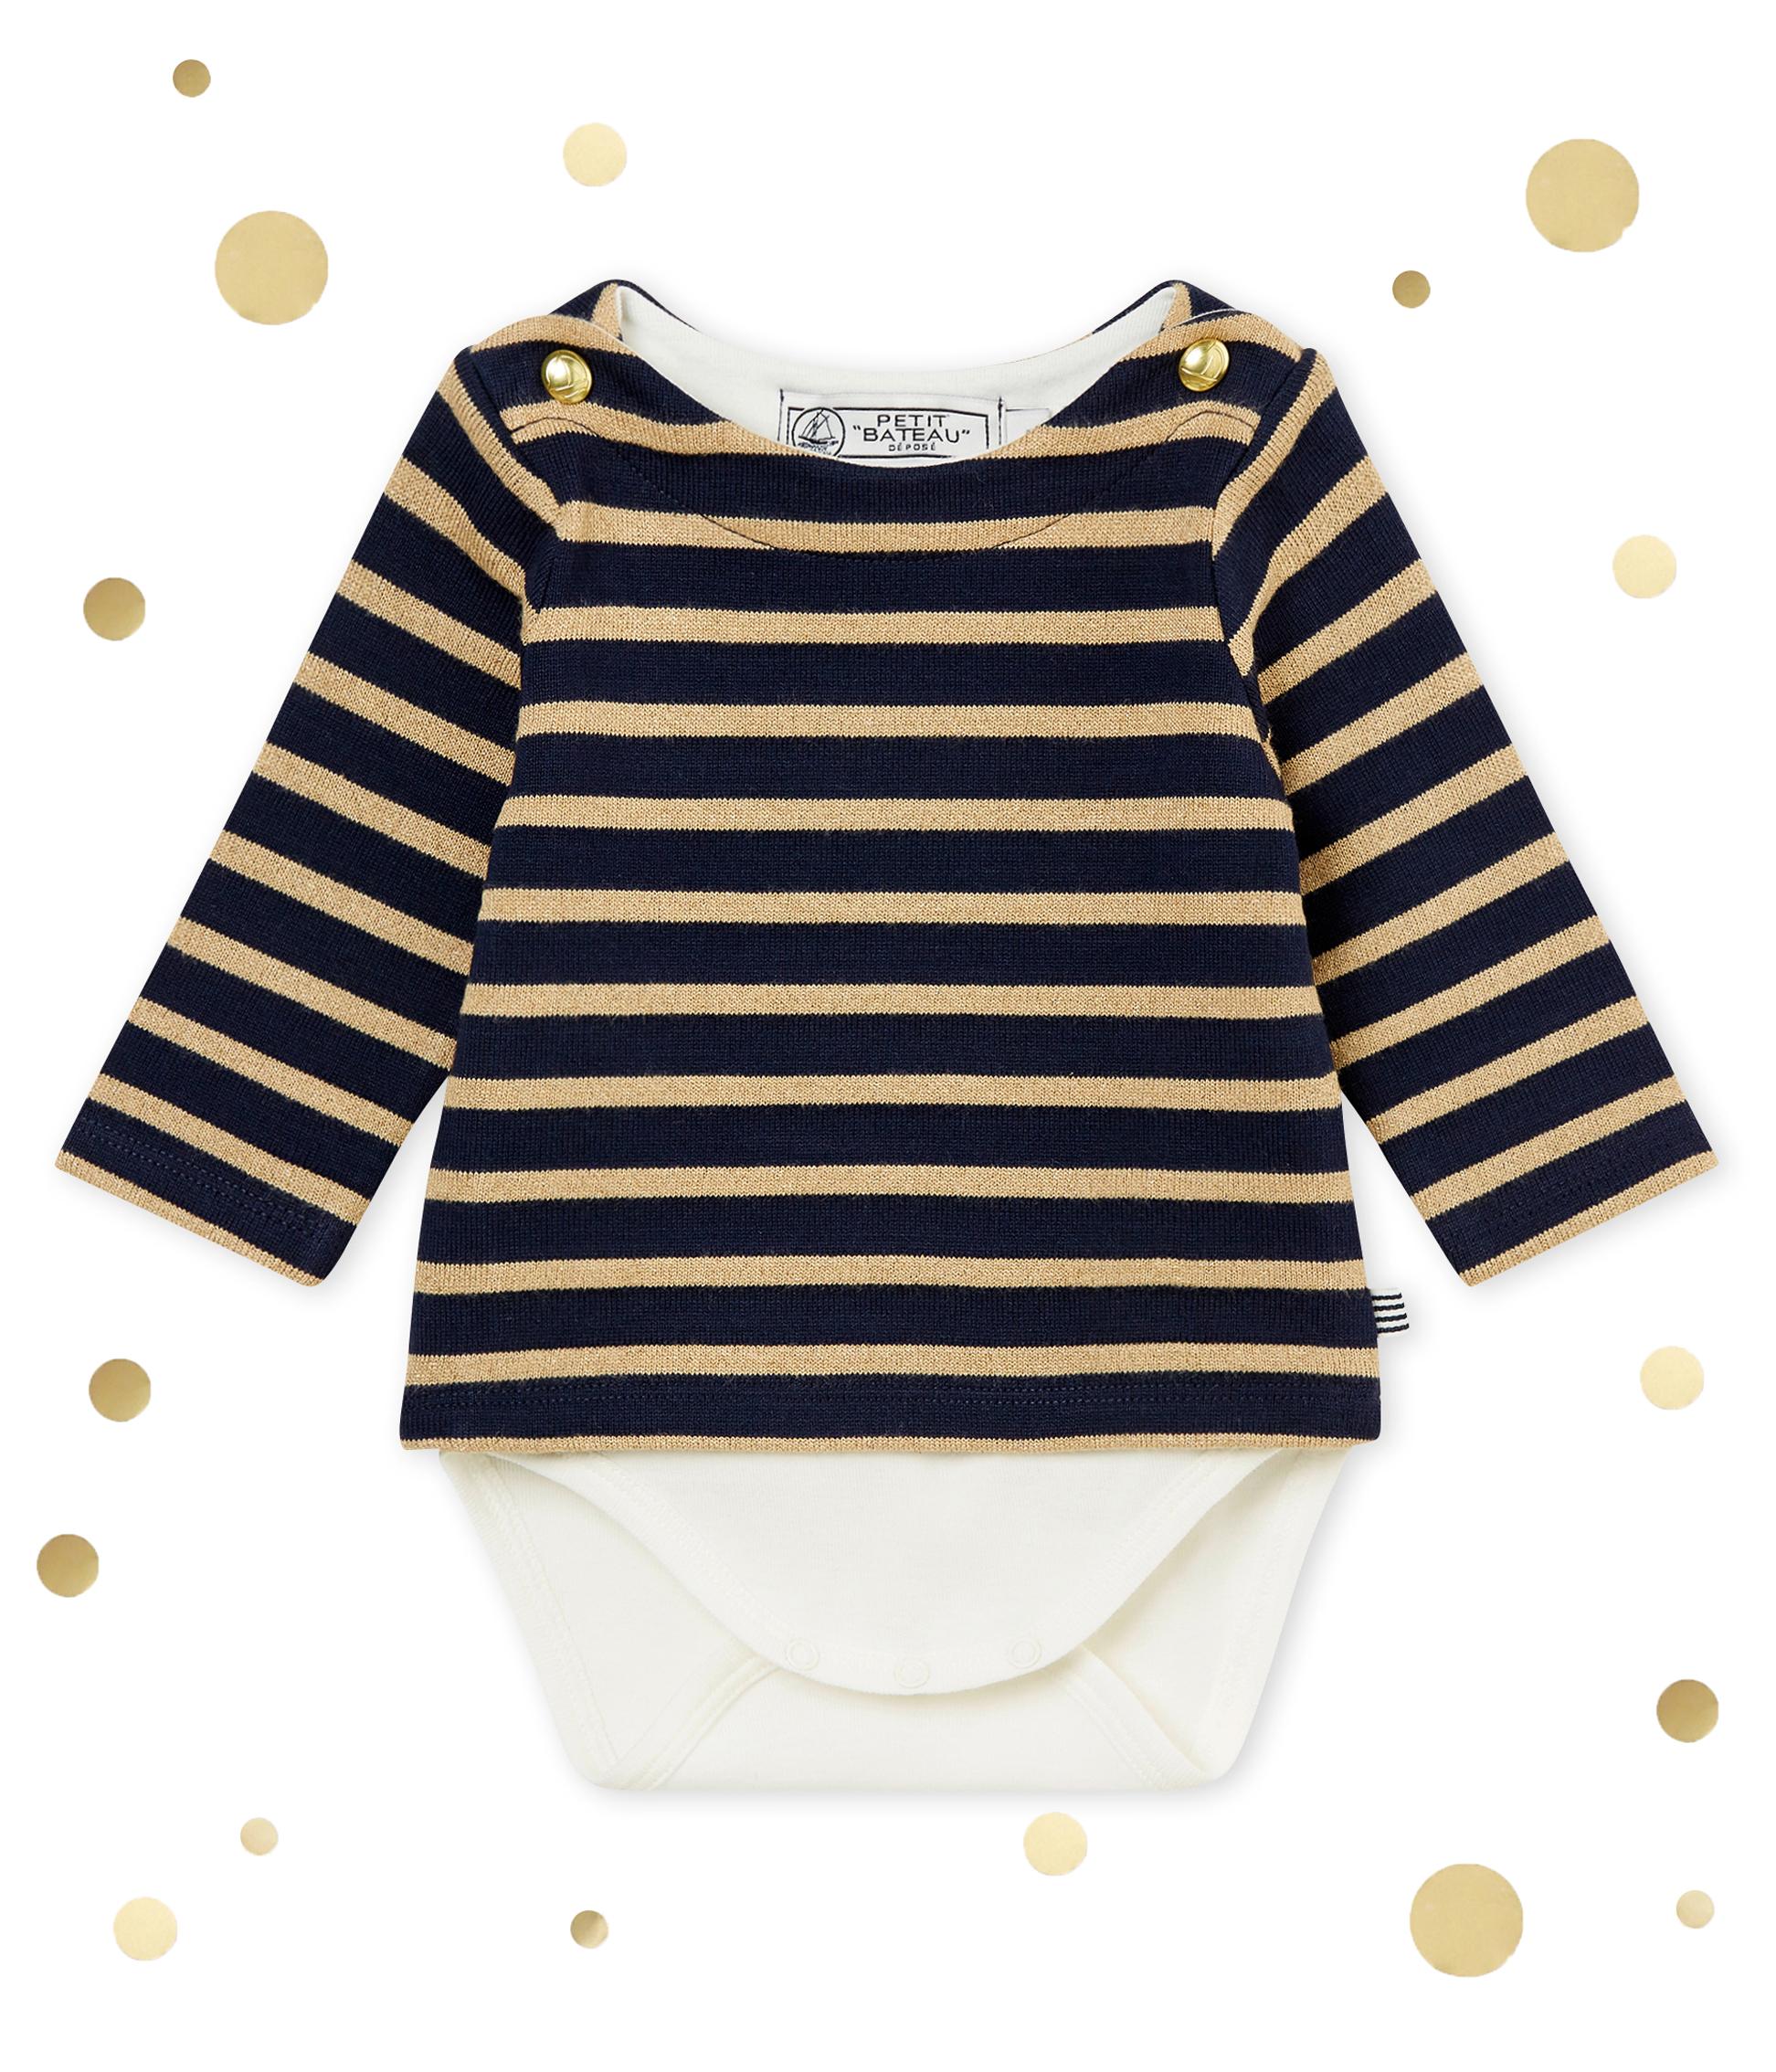 43af260e1c4 Baby girl's sailor striped body T-shirt